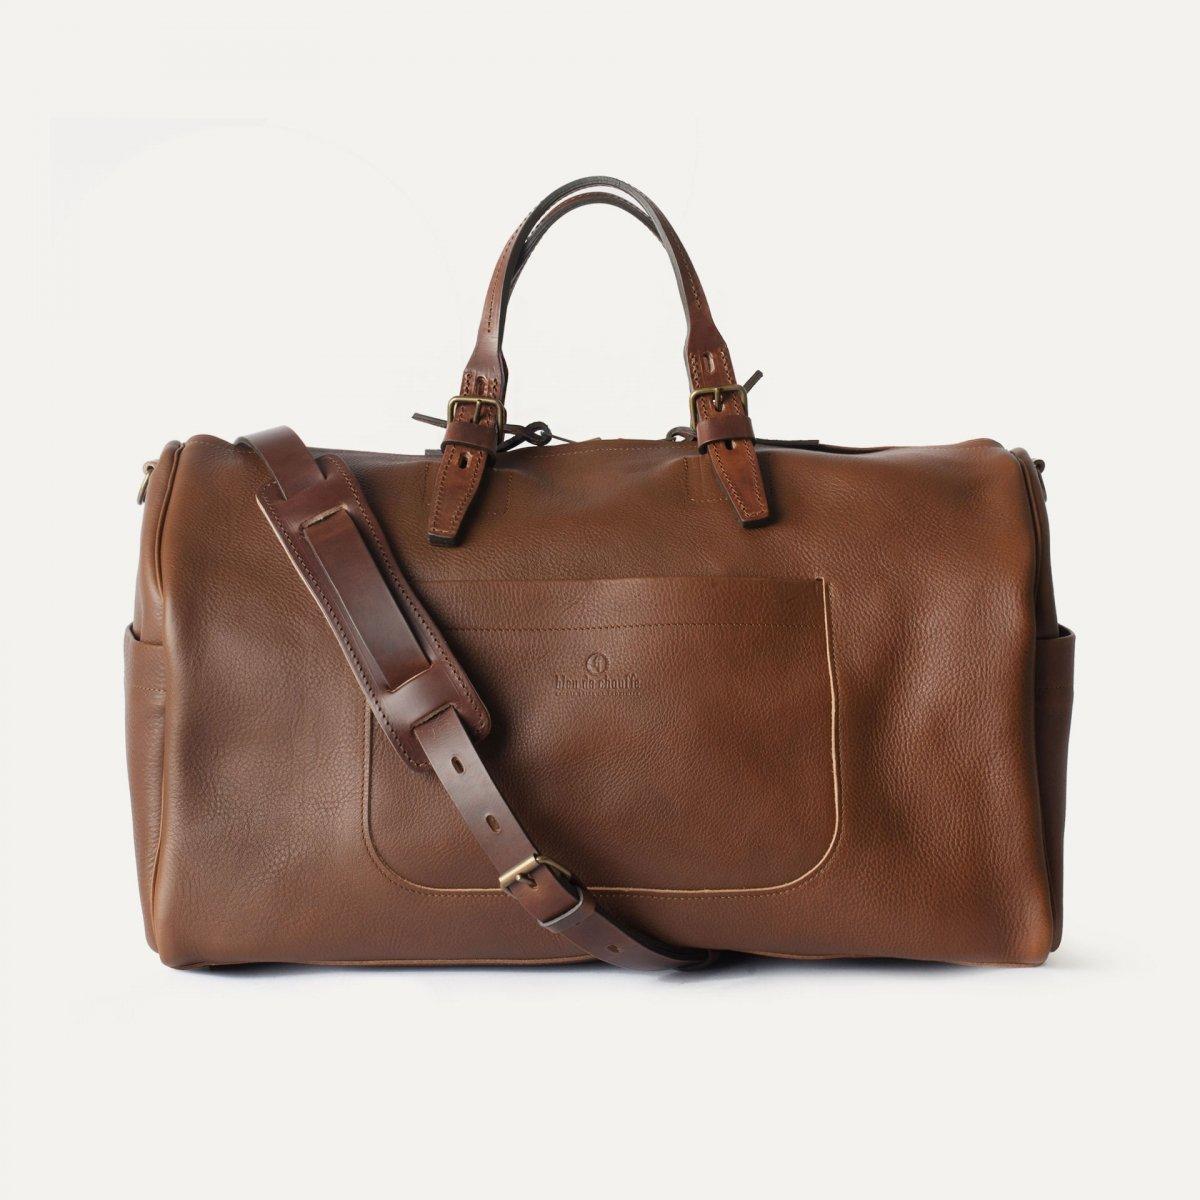 Hobo Travel bag - Cuba Libre (image n°1)